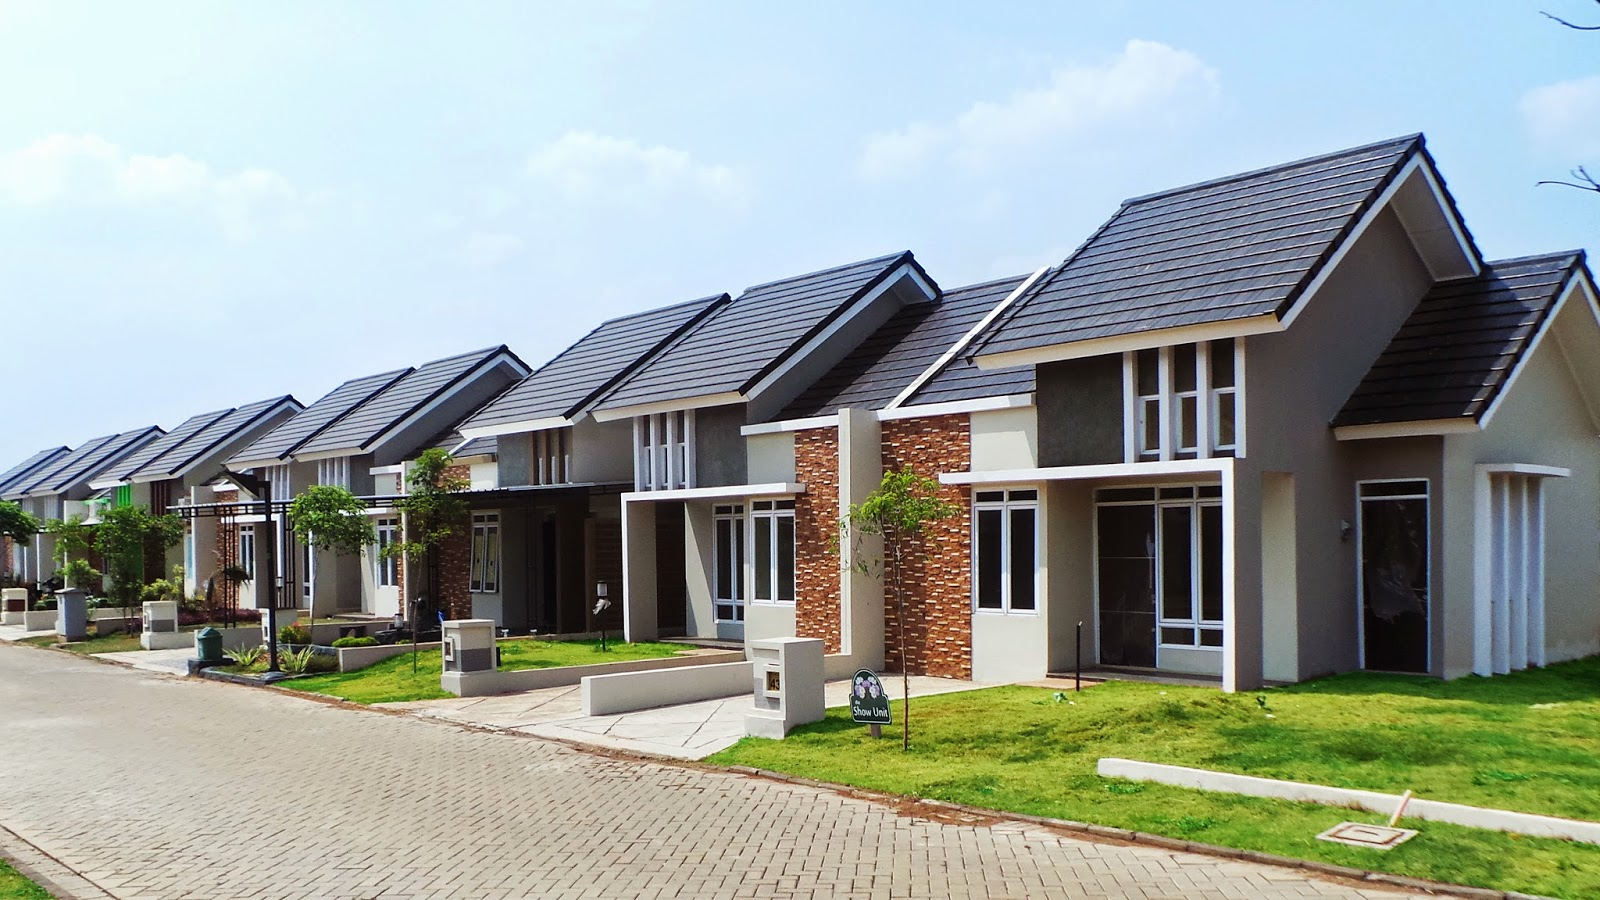 Rumah Dijual Di Bandung Harga 150 Juta